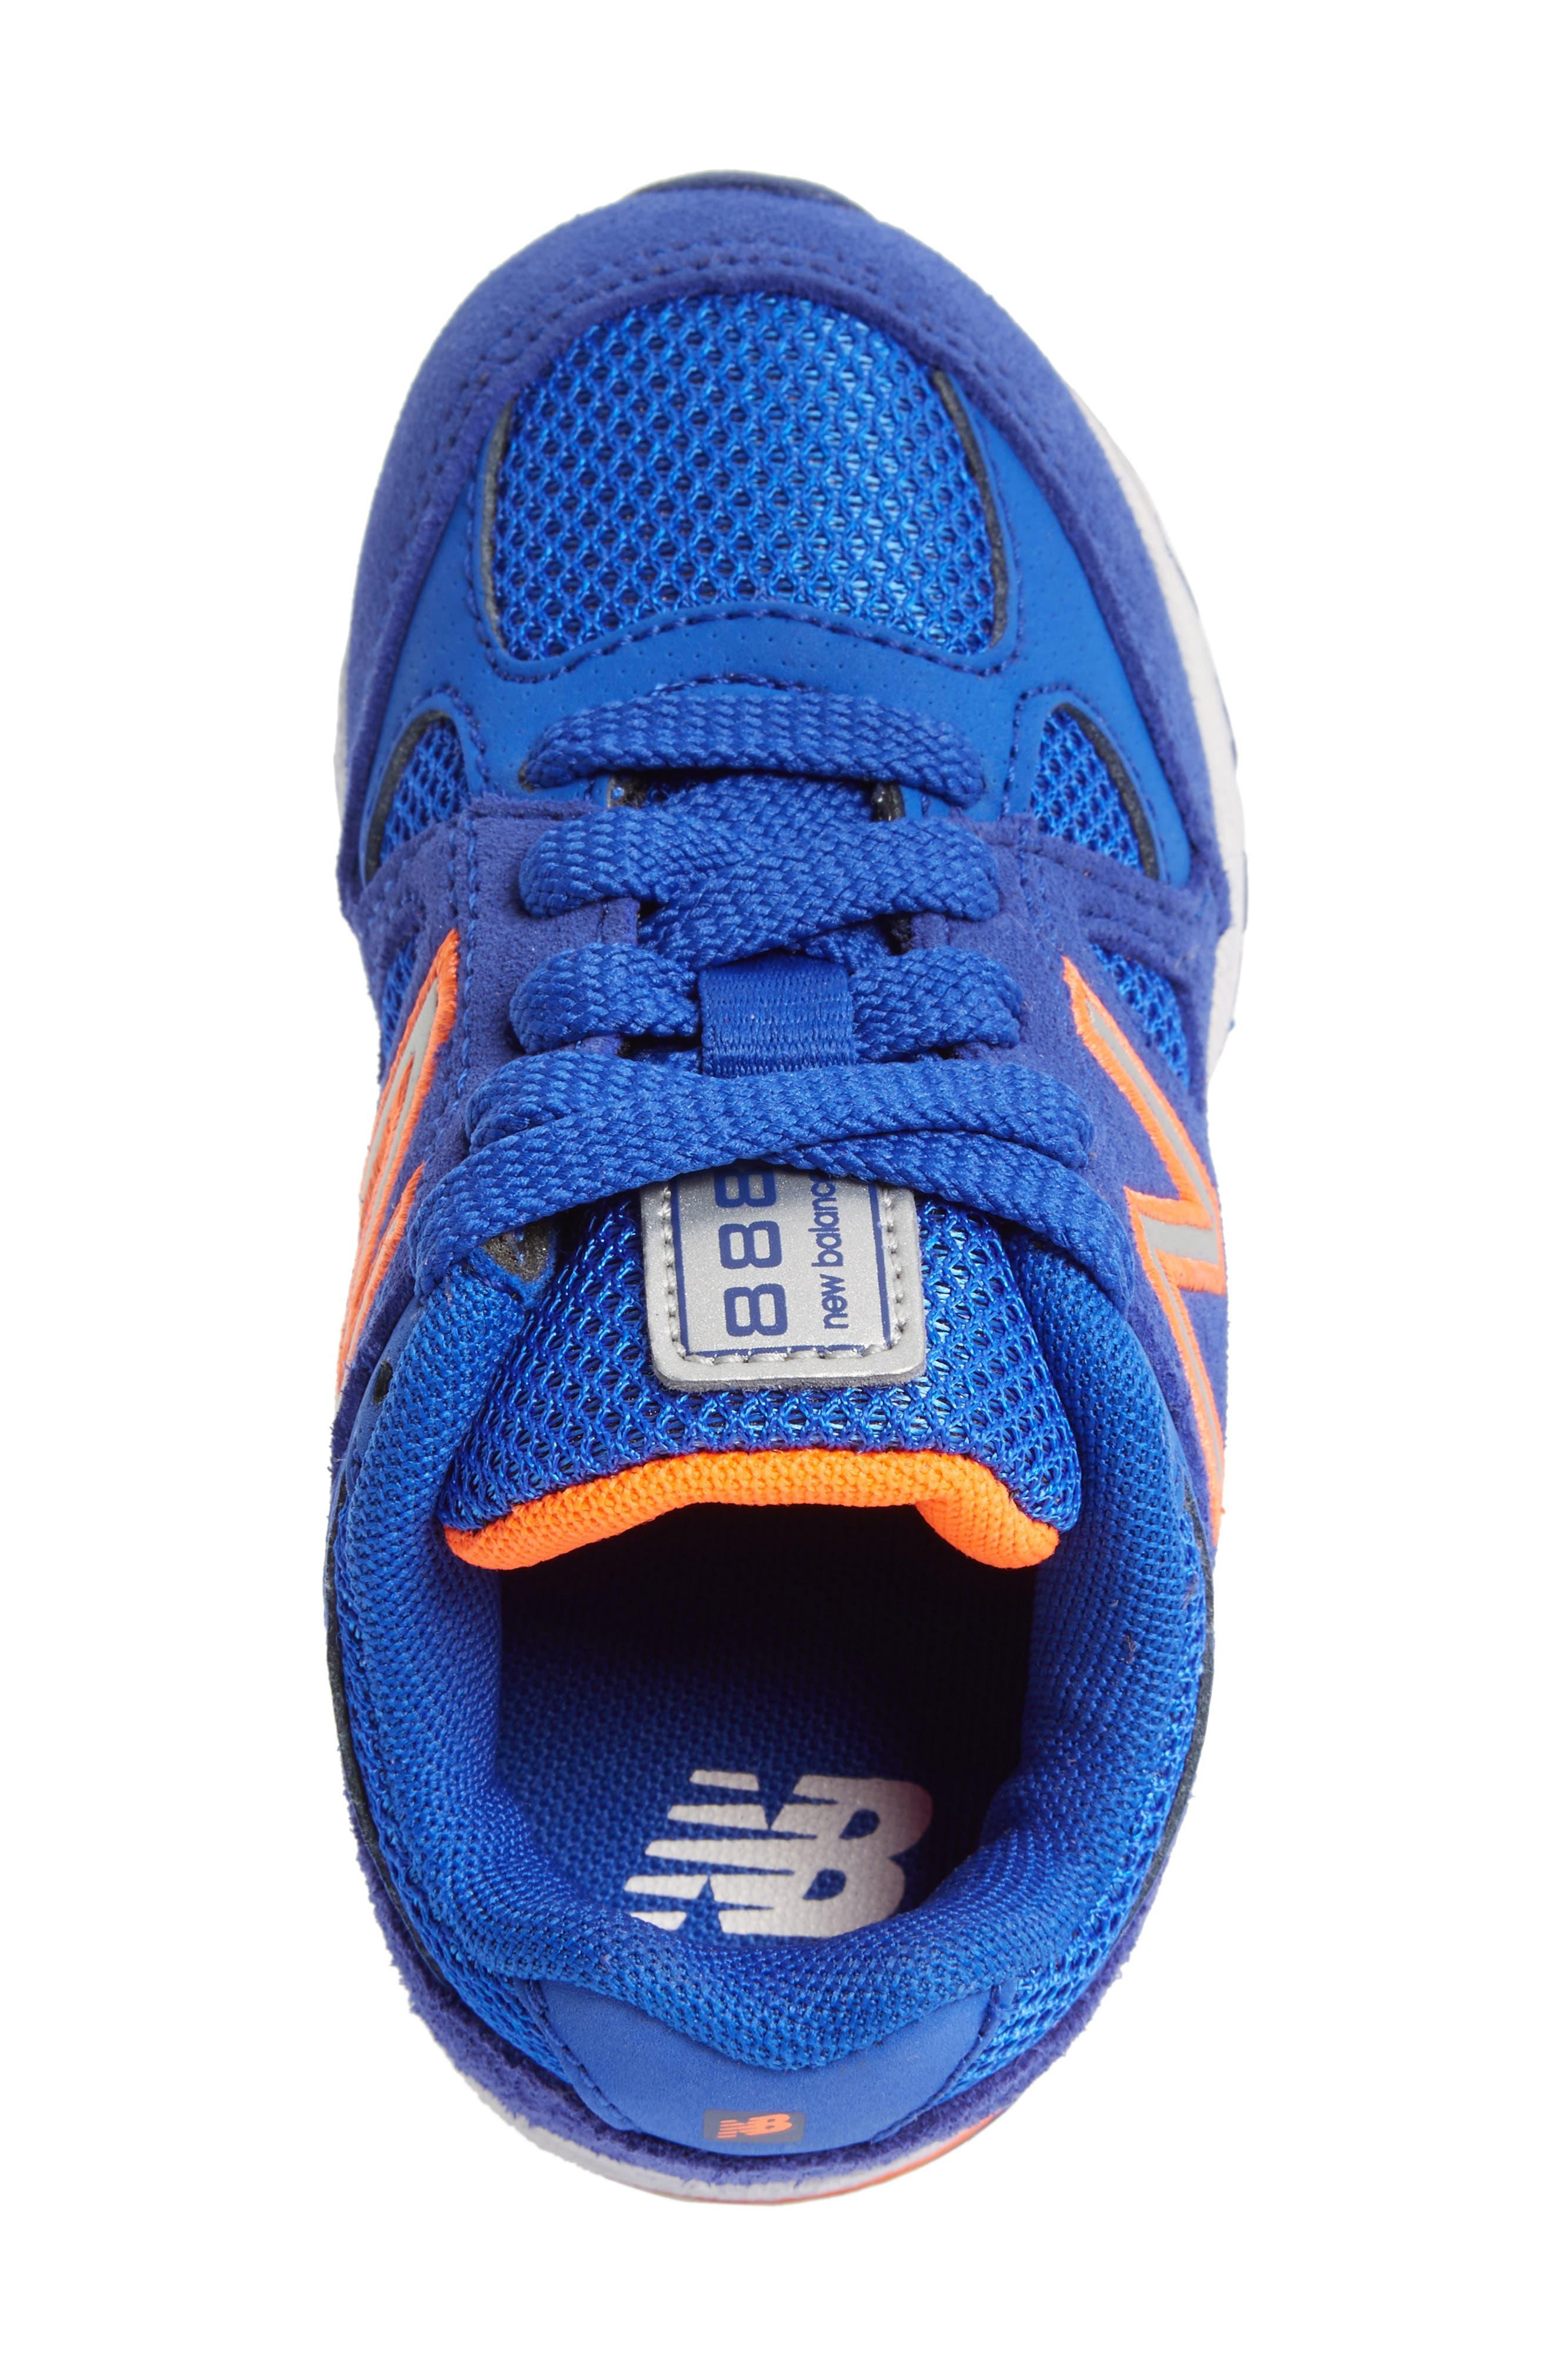 888 Sneaker,                             Alternate thumbnail 5, color,                             Pacific